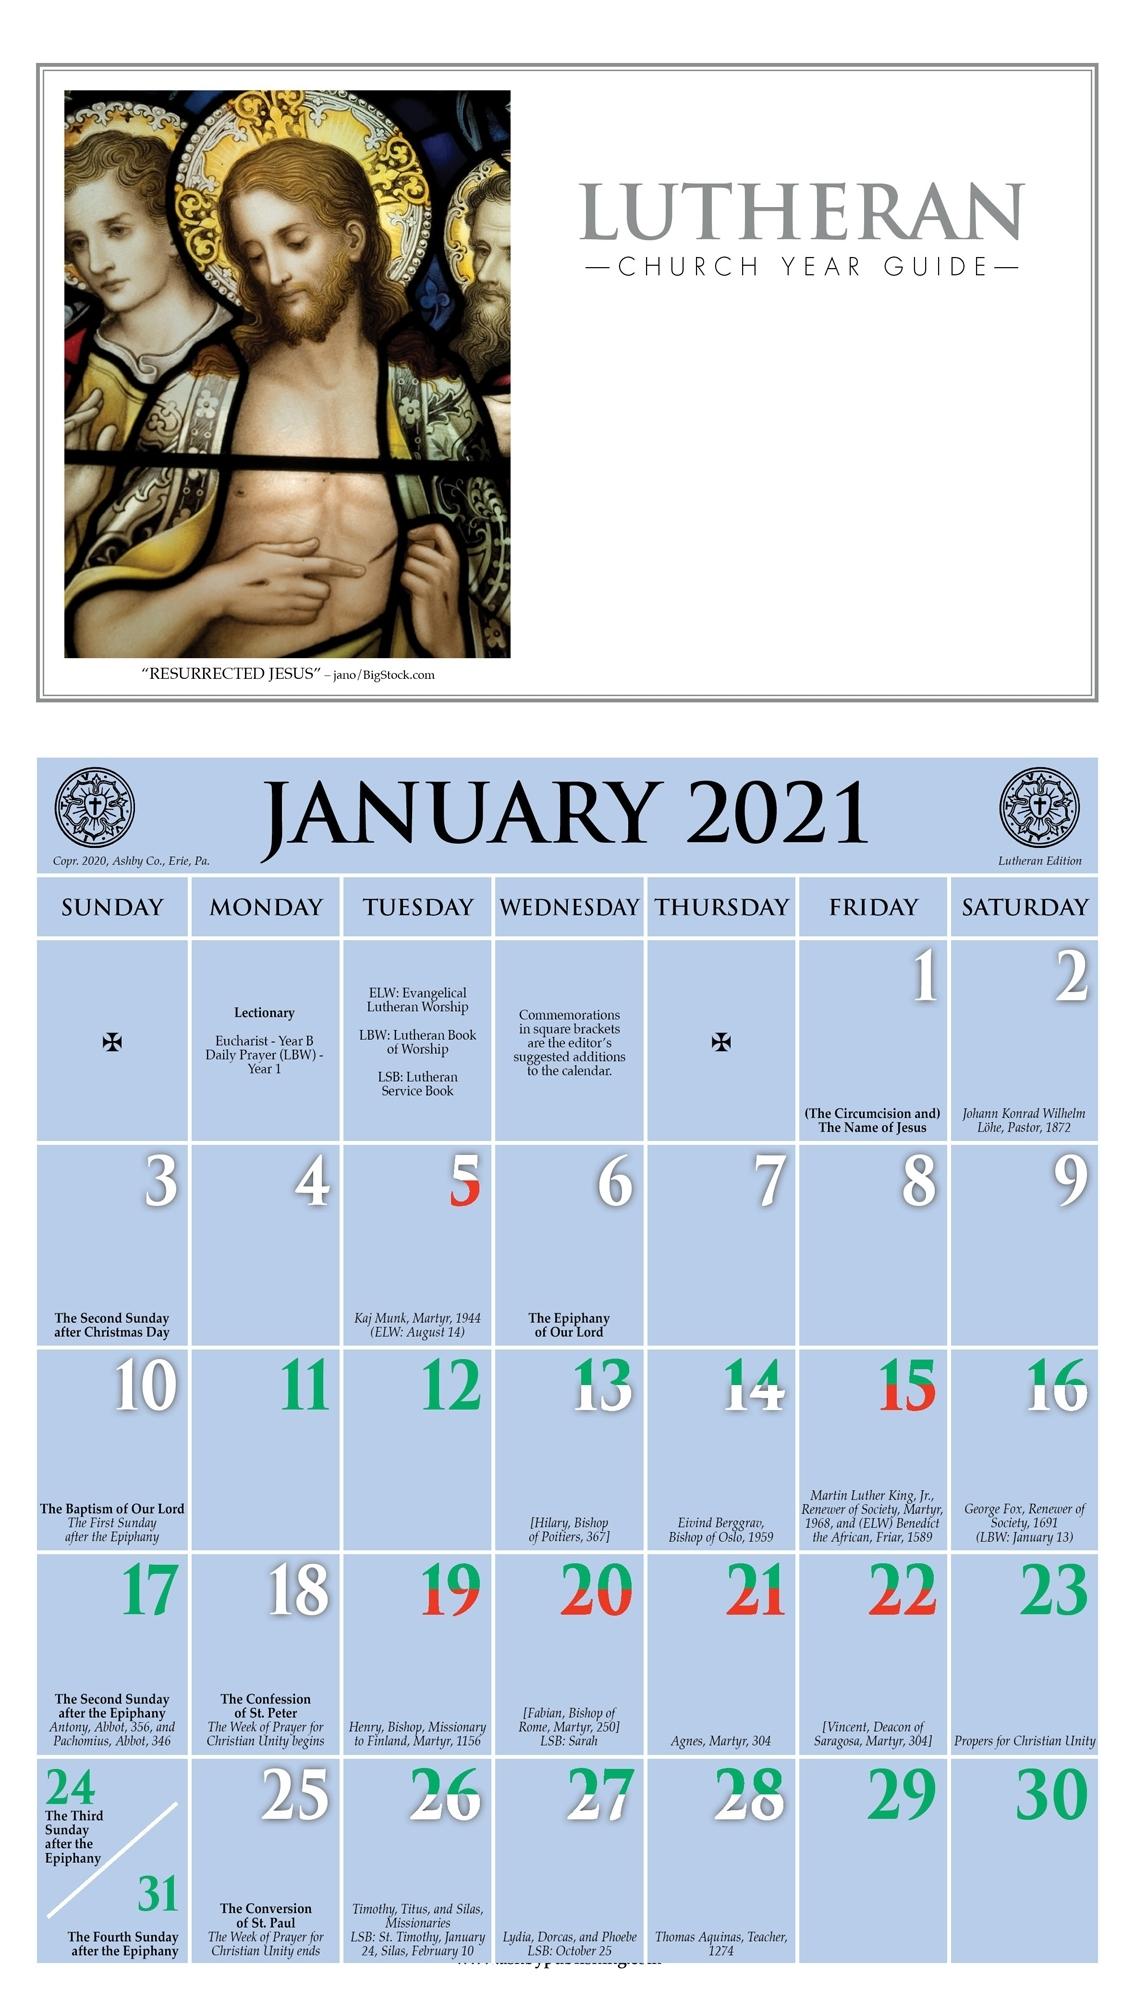 2021 Church Year Calendar with A Liturgical Calendar For The Year 2020